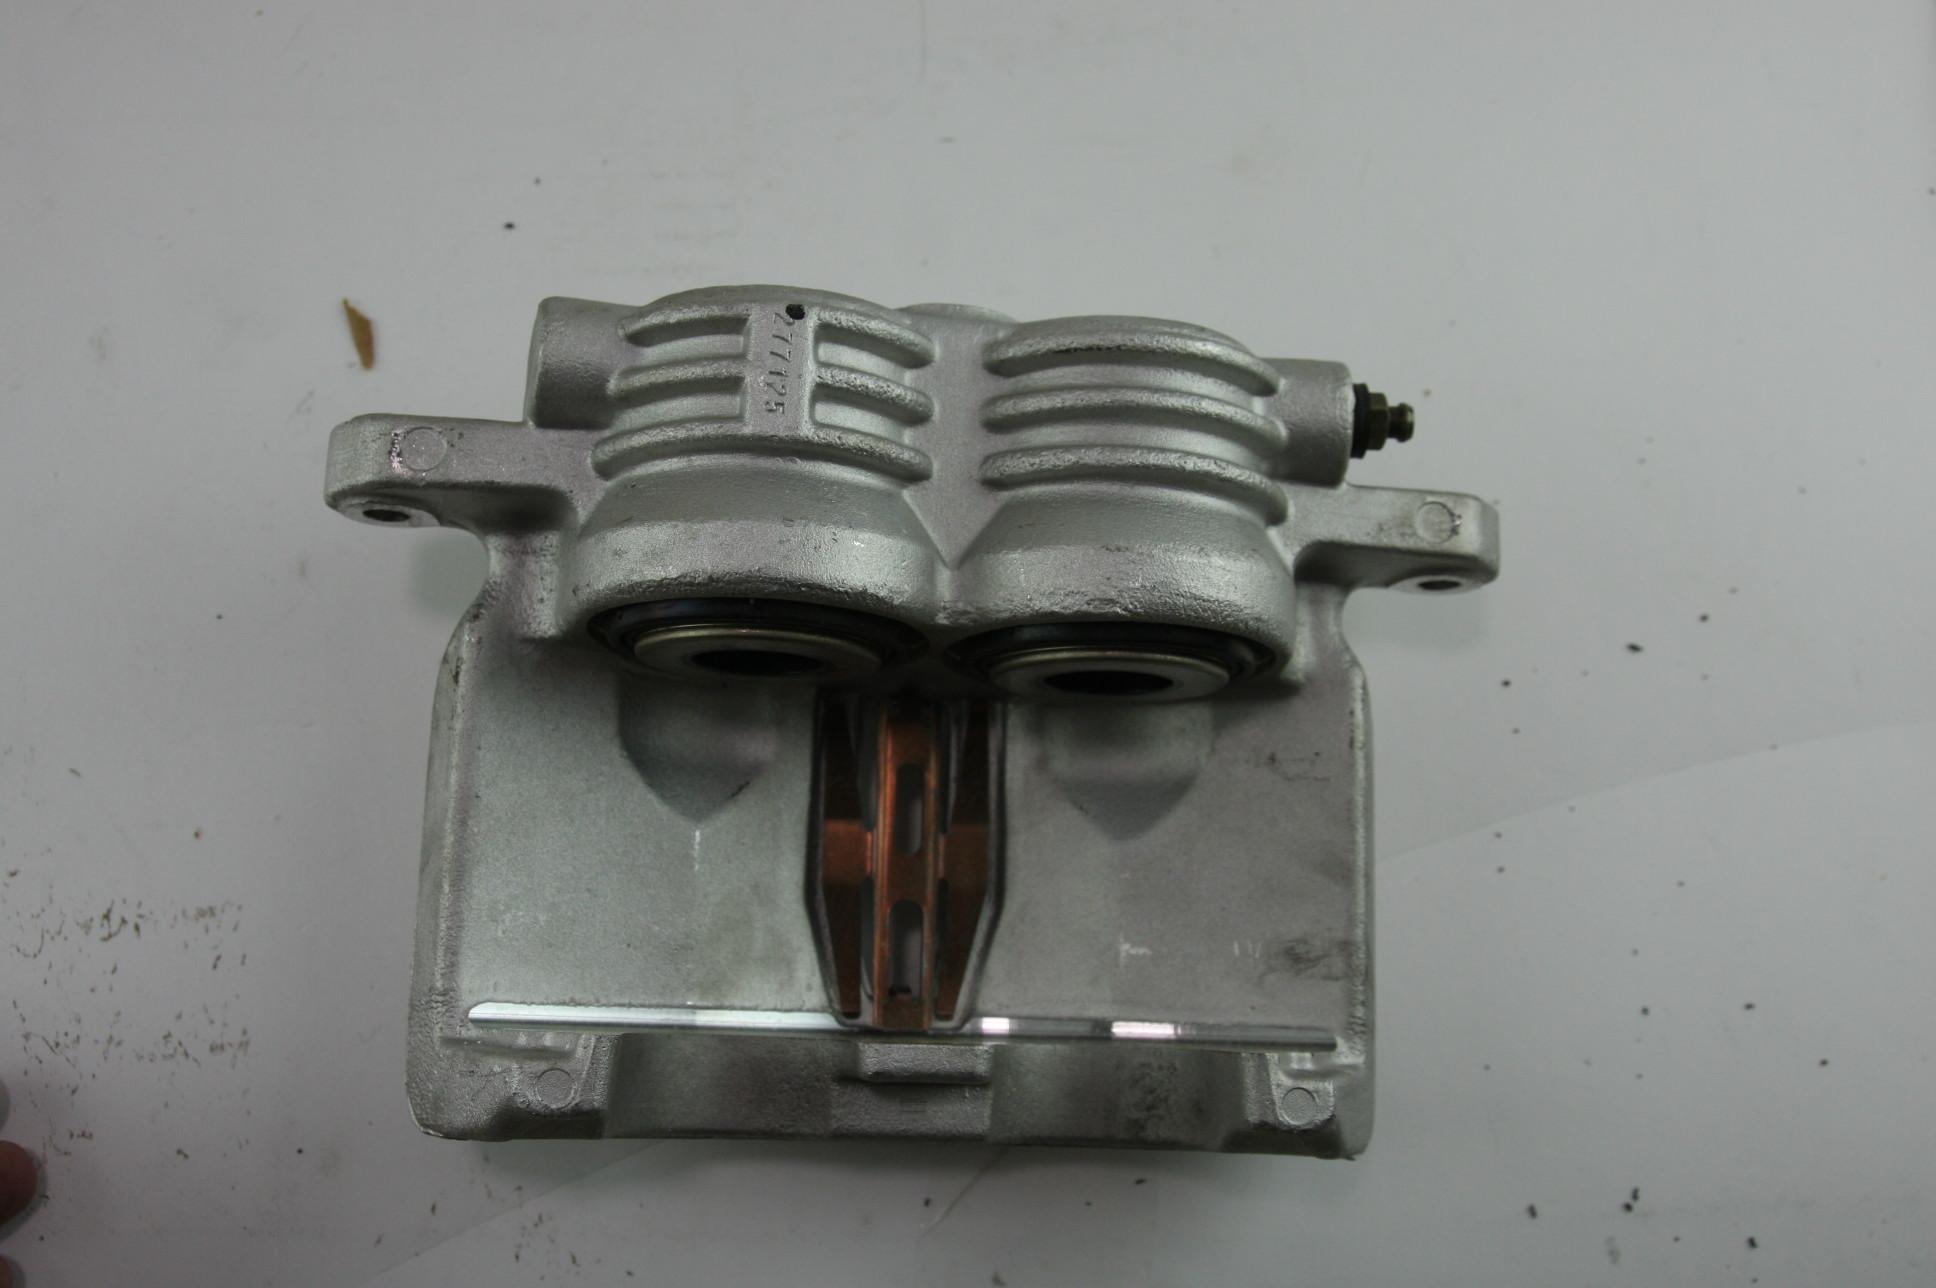 *** New Genuine OEM ACDelco 172-1612 GM 18043521 Disc Brake Caliper Rear Right - image 5